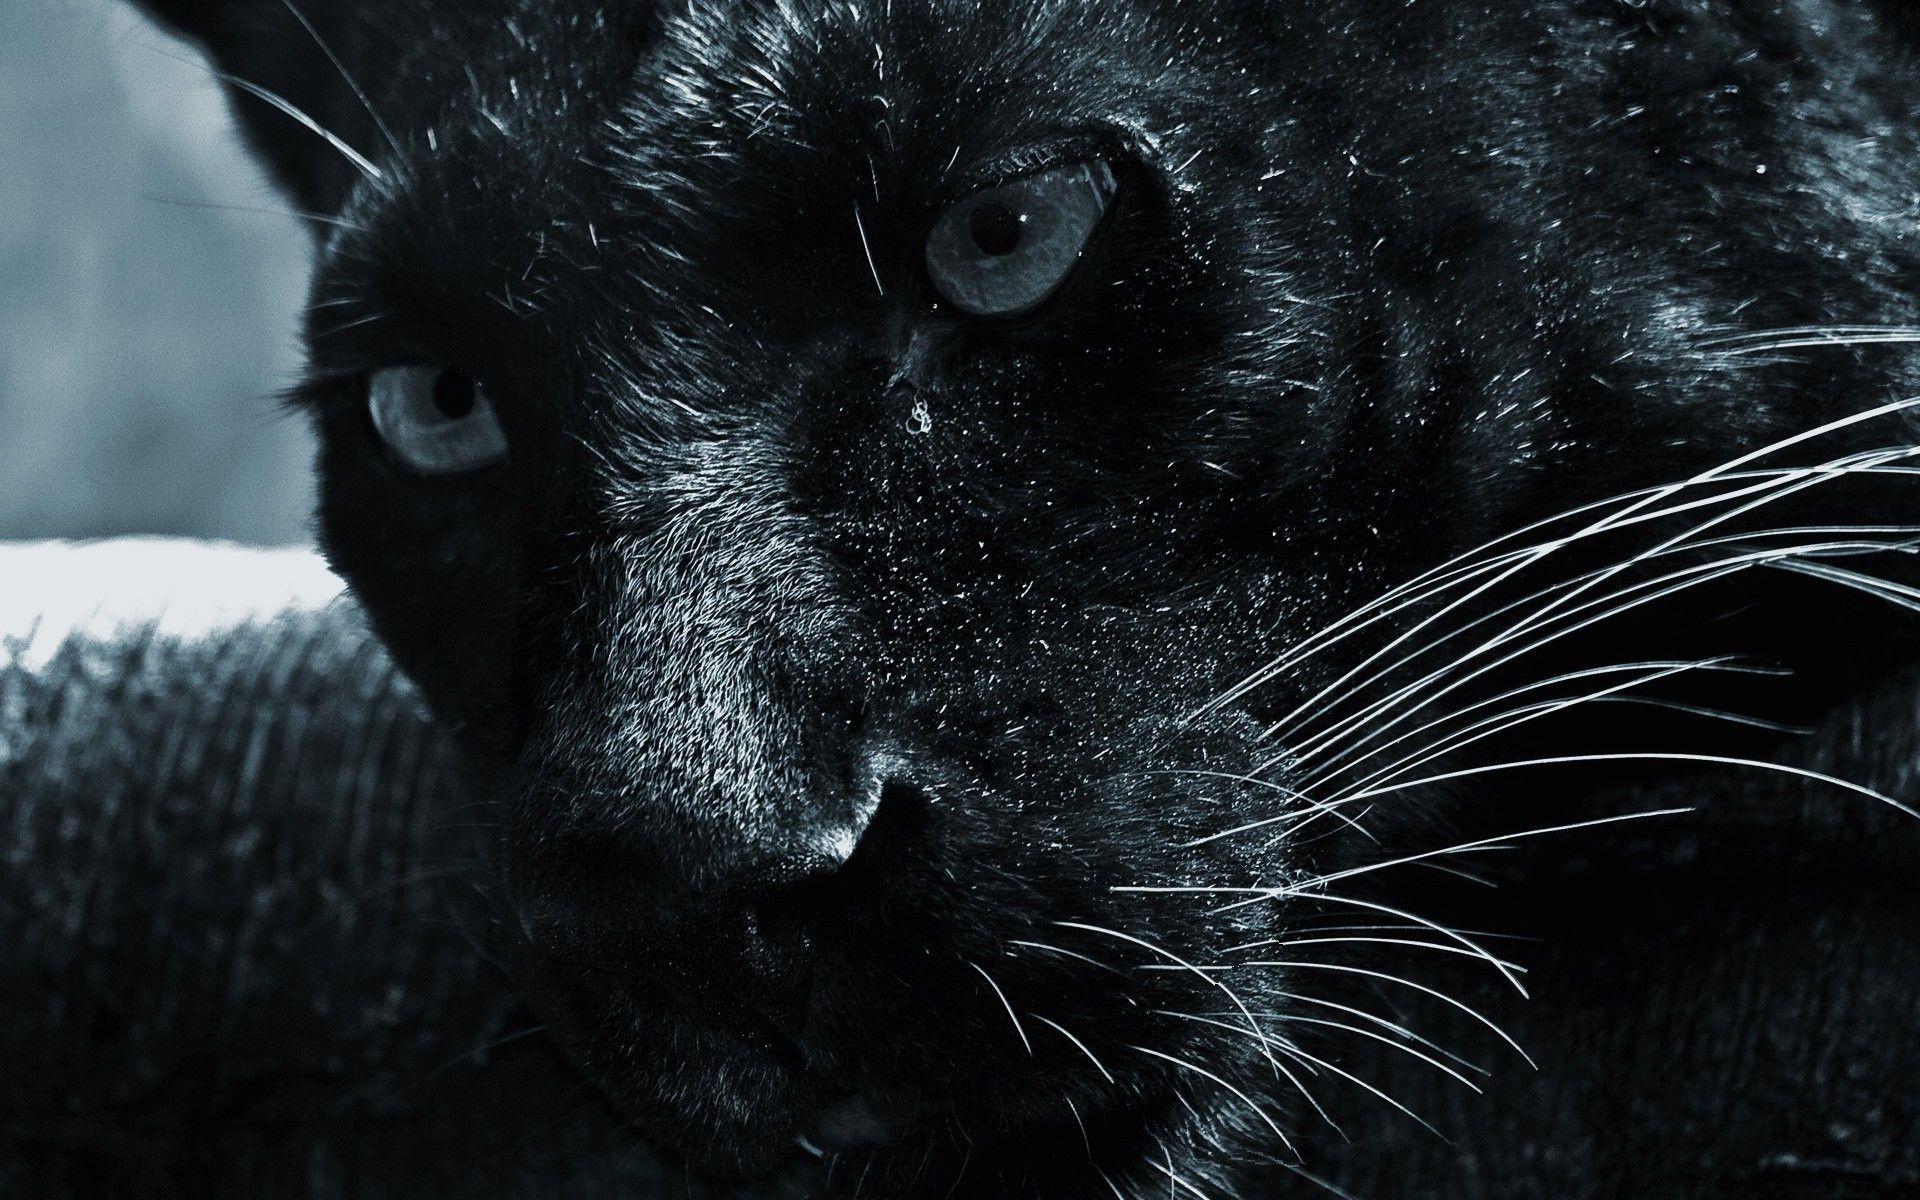 Panther, ID: AC49, Rosalia Cuevas